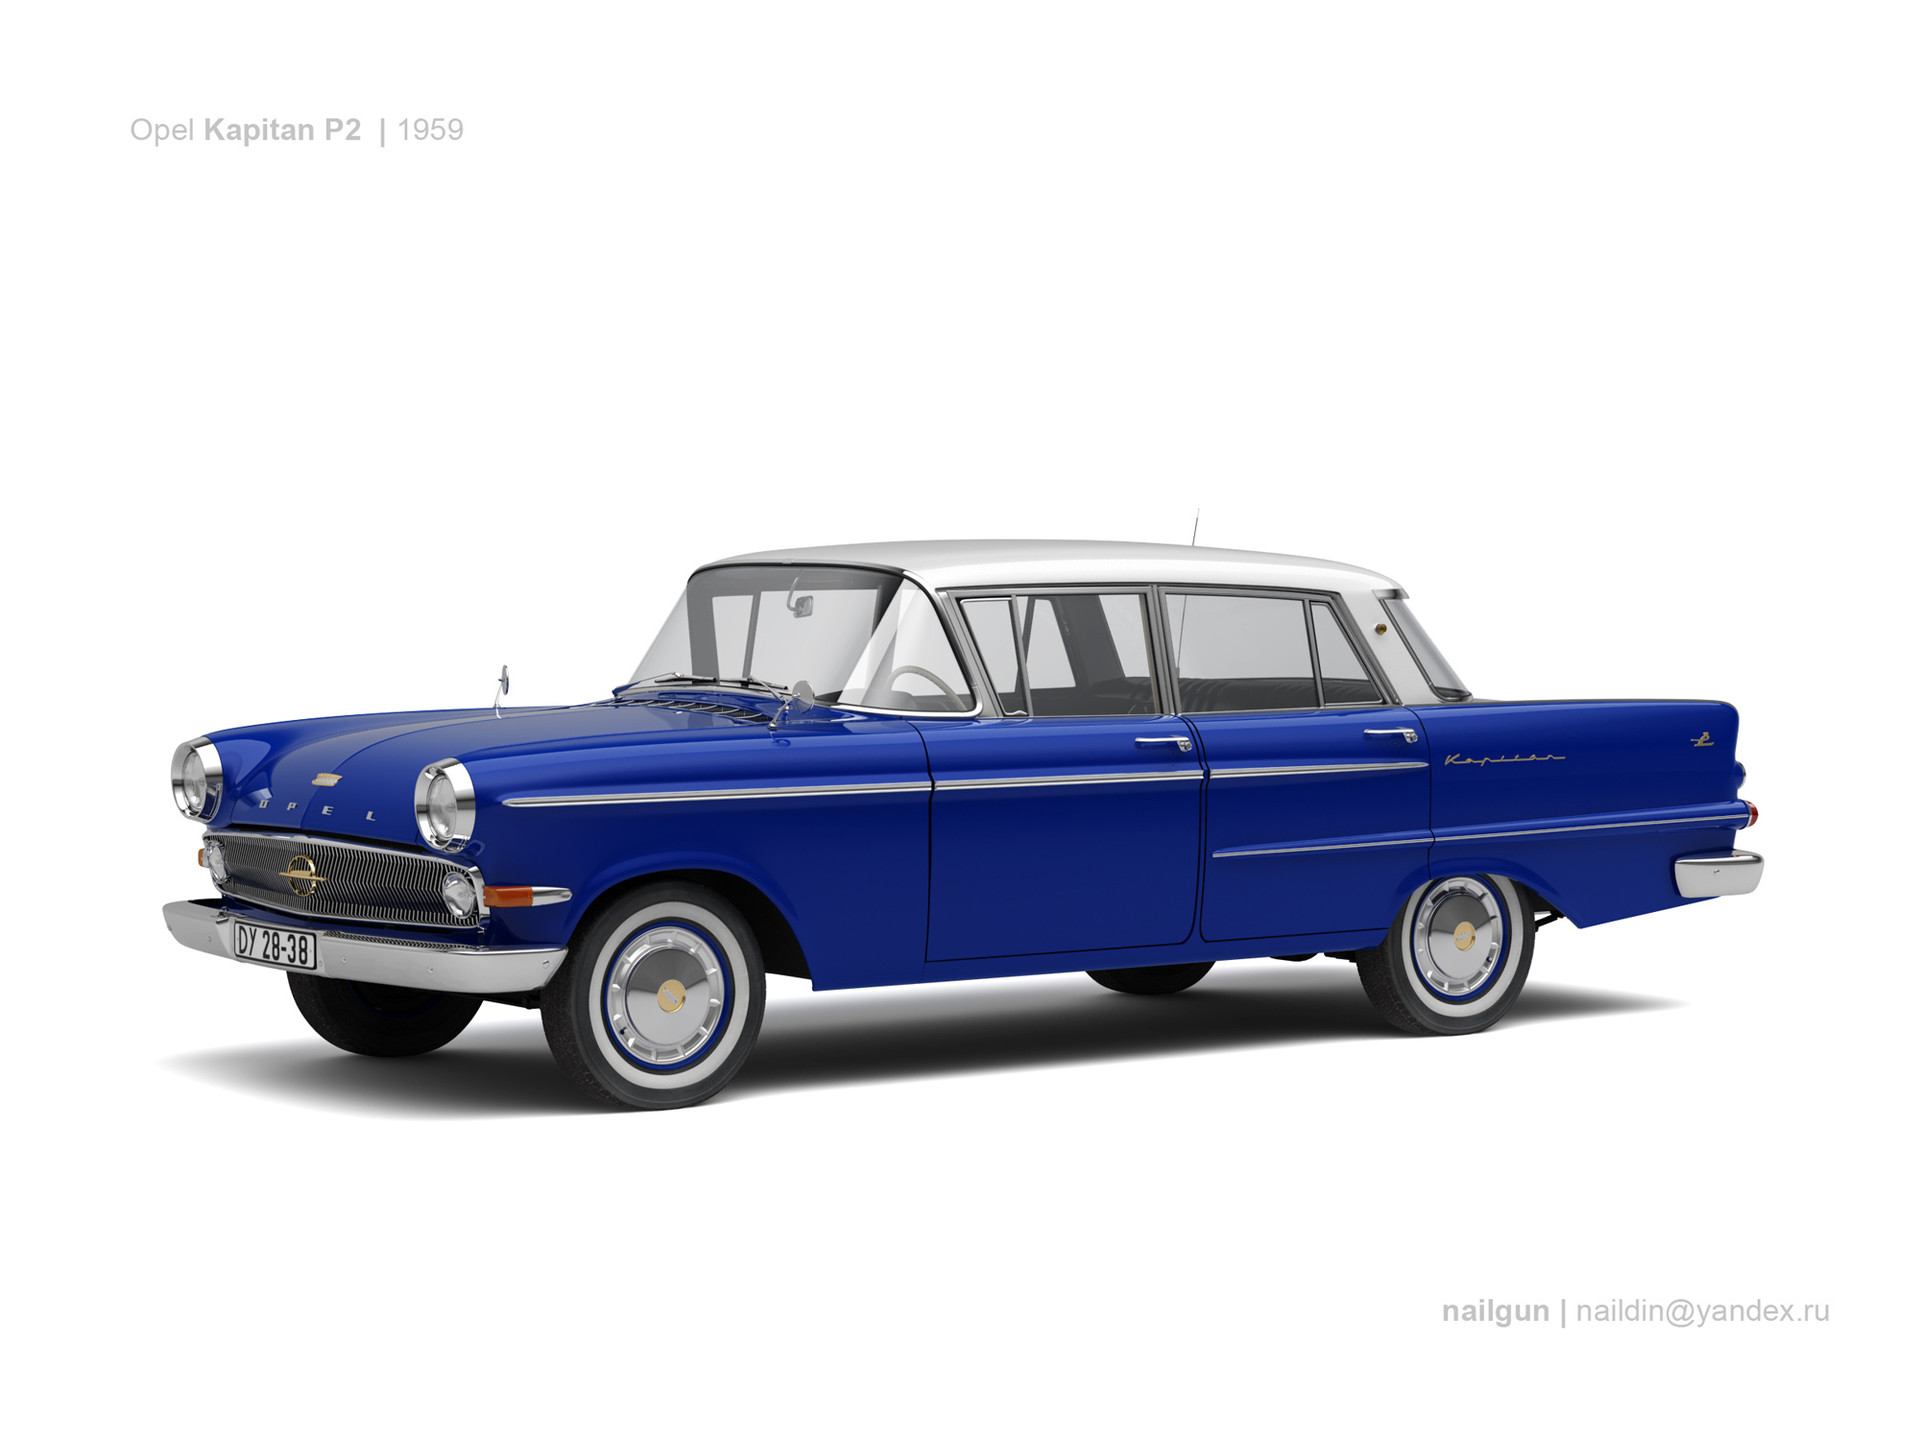 Nail khusnutdinov germany opel kapitan p2 1959 0